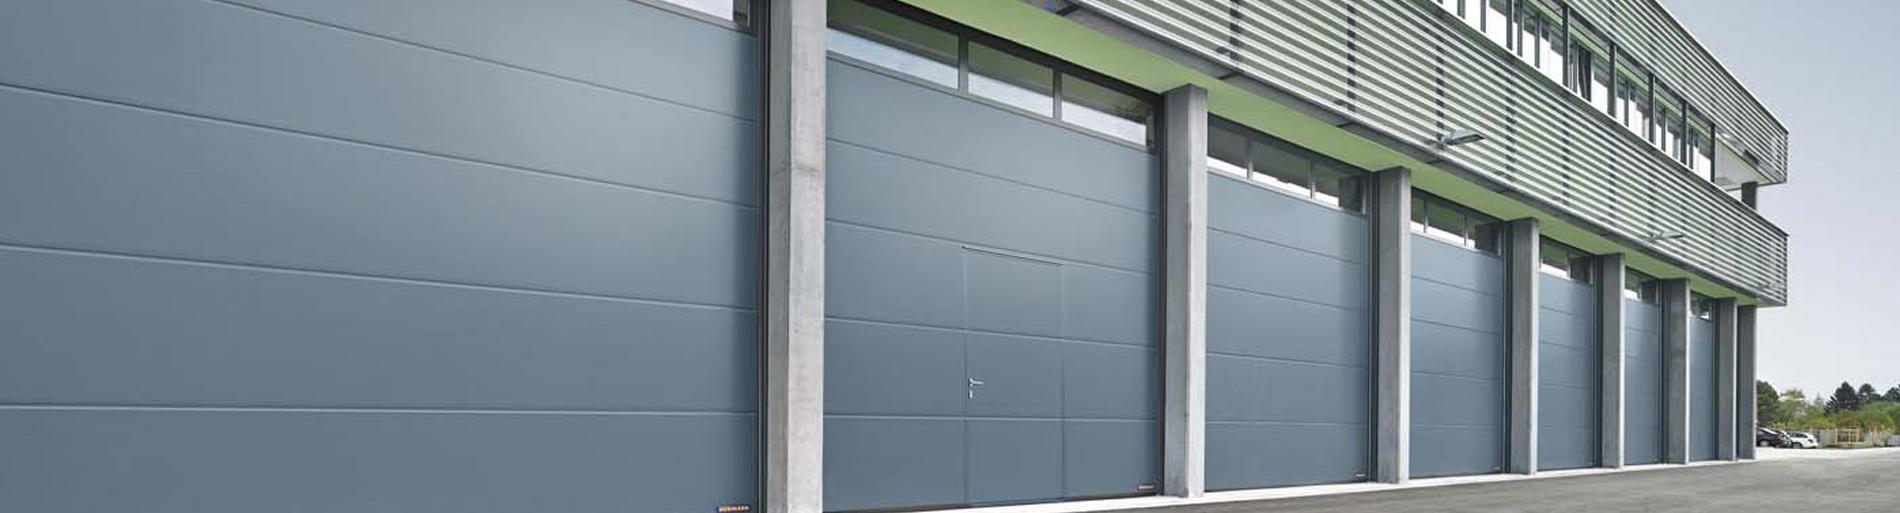 Sezionali hormann vendita porte sezionali tecno serramenti for Hormann sezionali